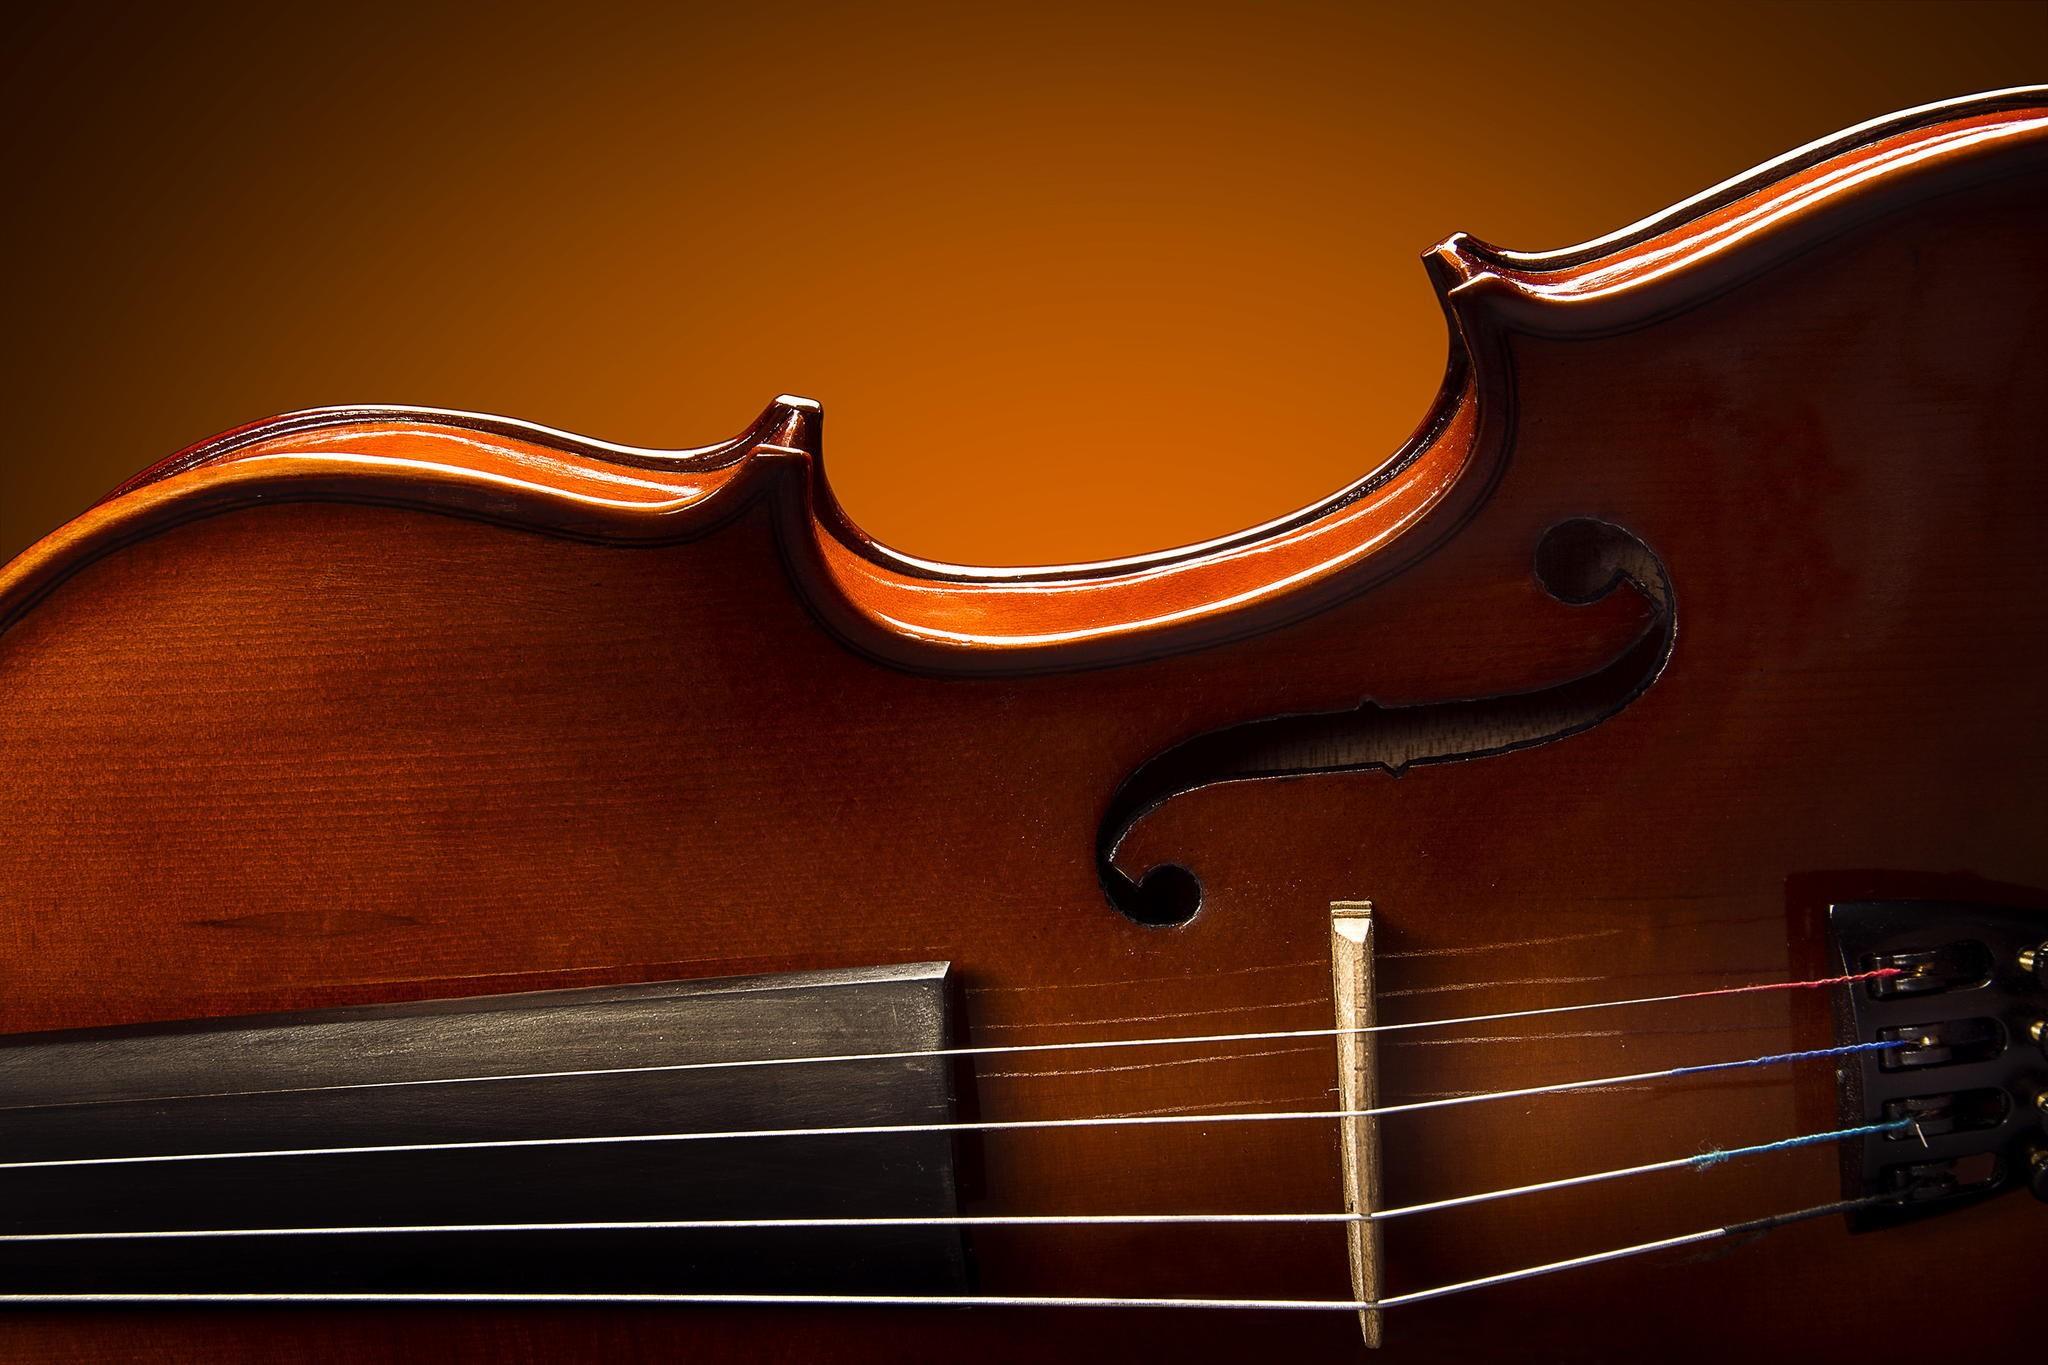 Wallpaper Musical Instrument Cello Viola Viol Plucked